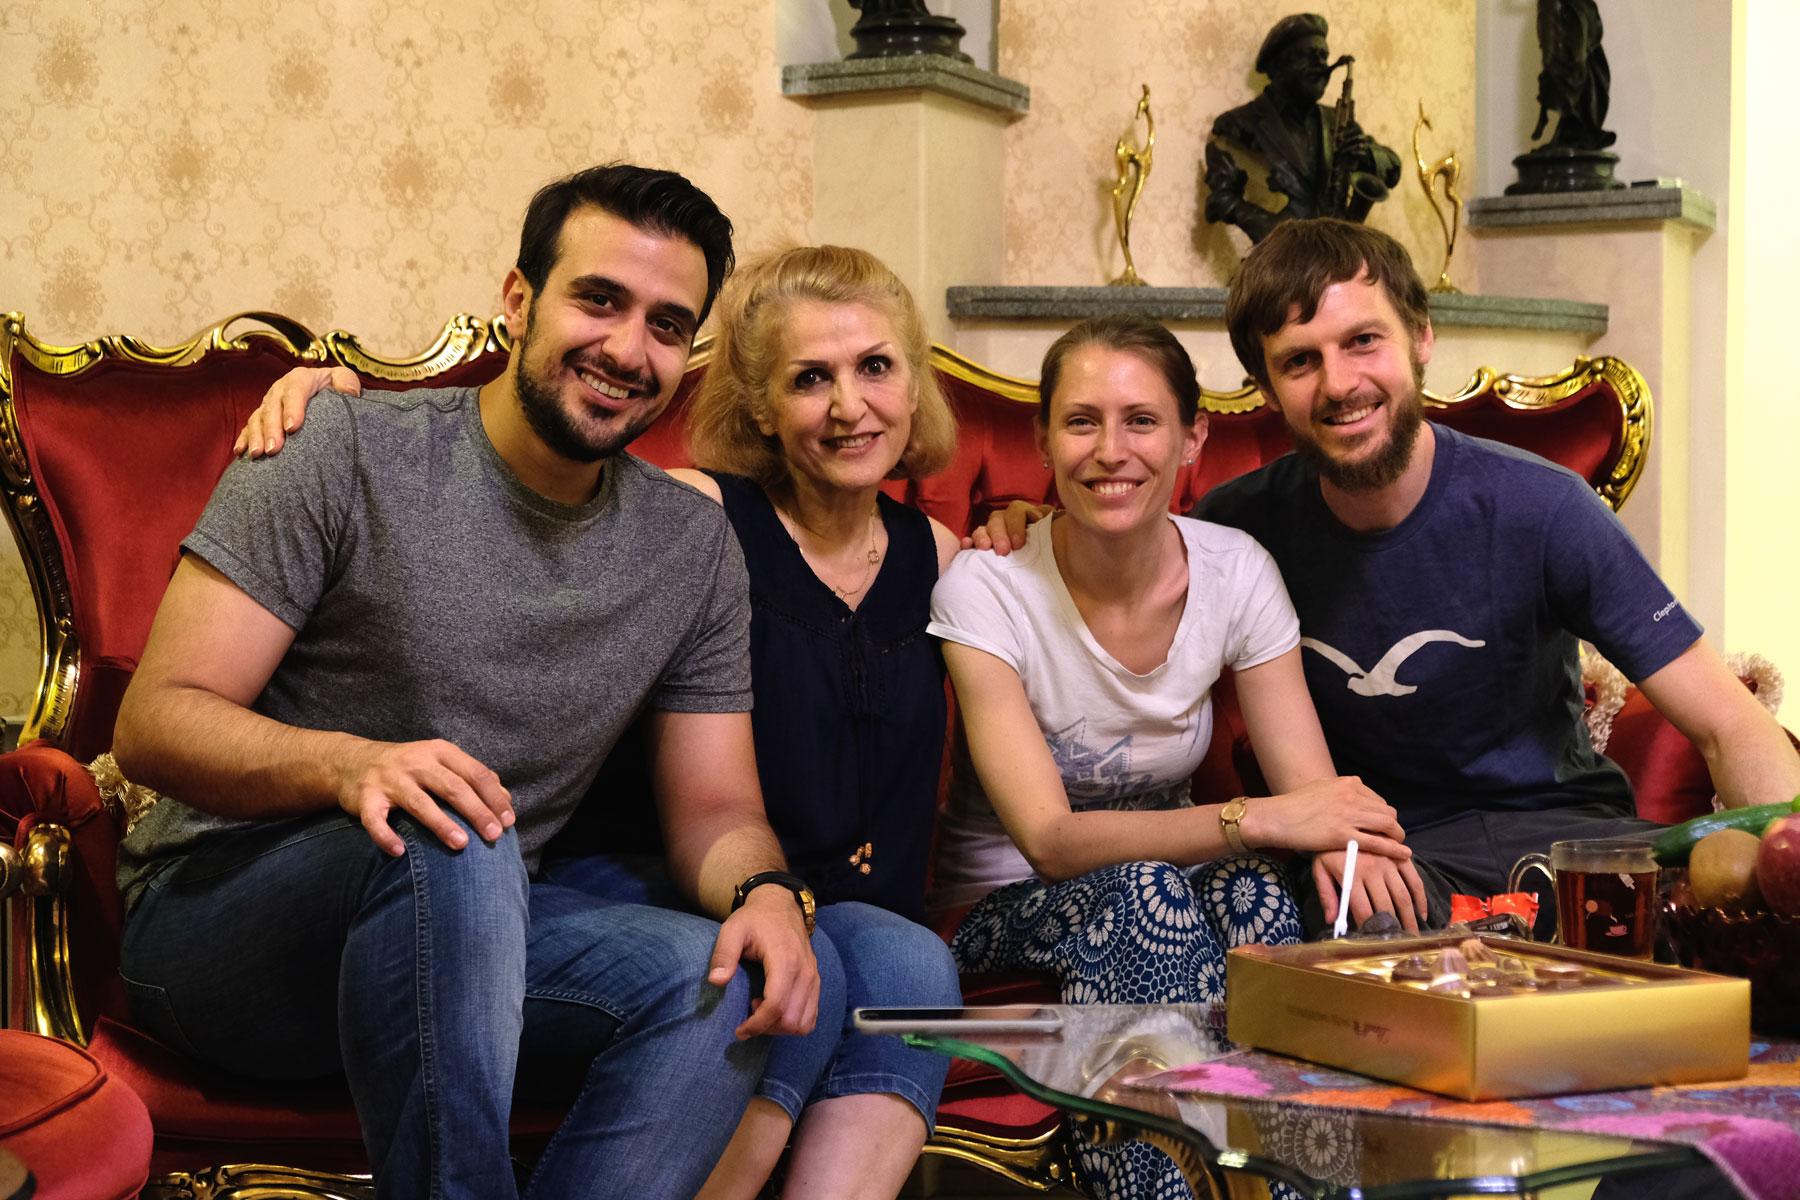 Mahbod, Mahrokh, Leo und Sebastian sitzen auf einem Sofa